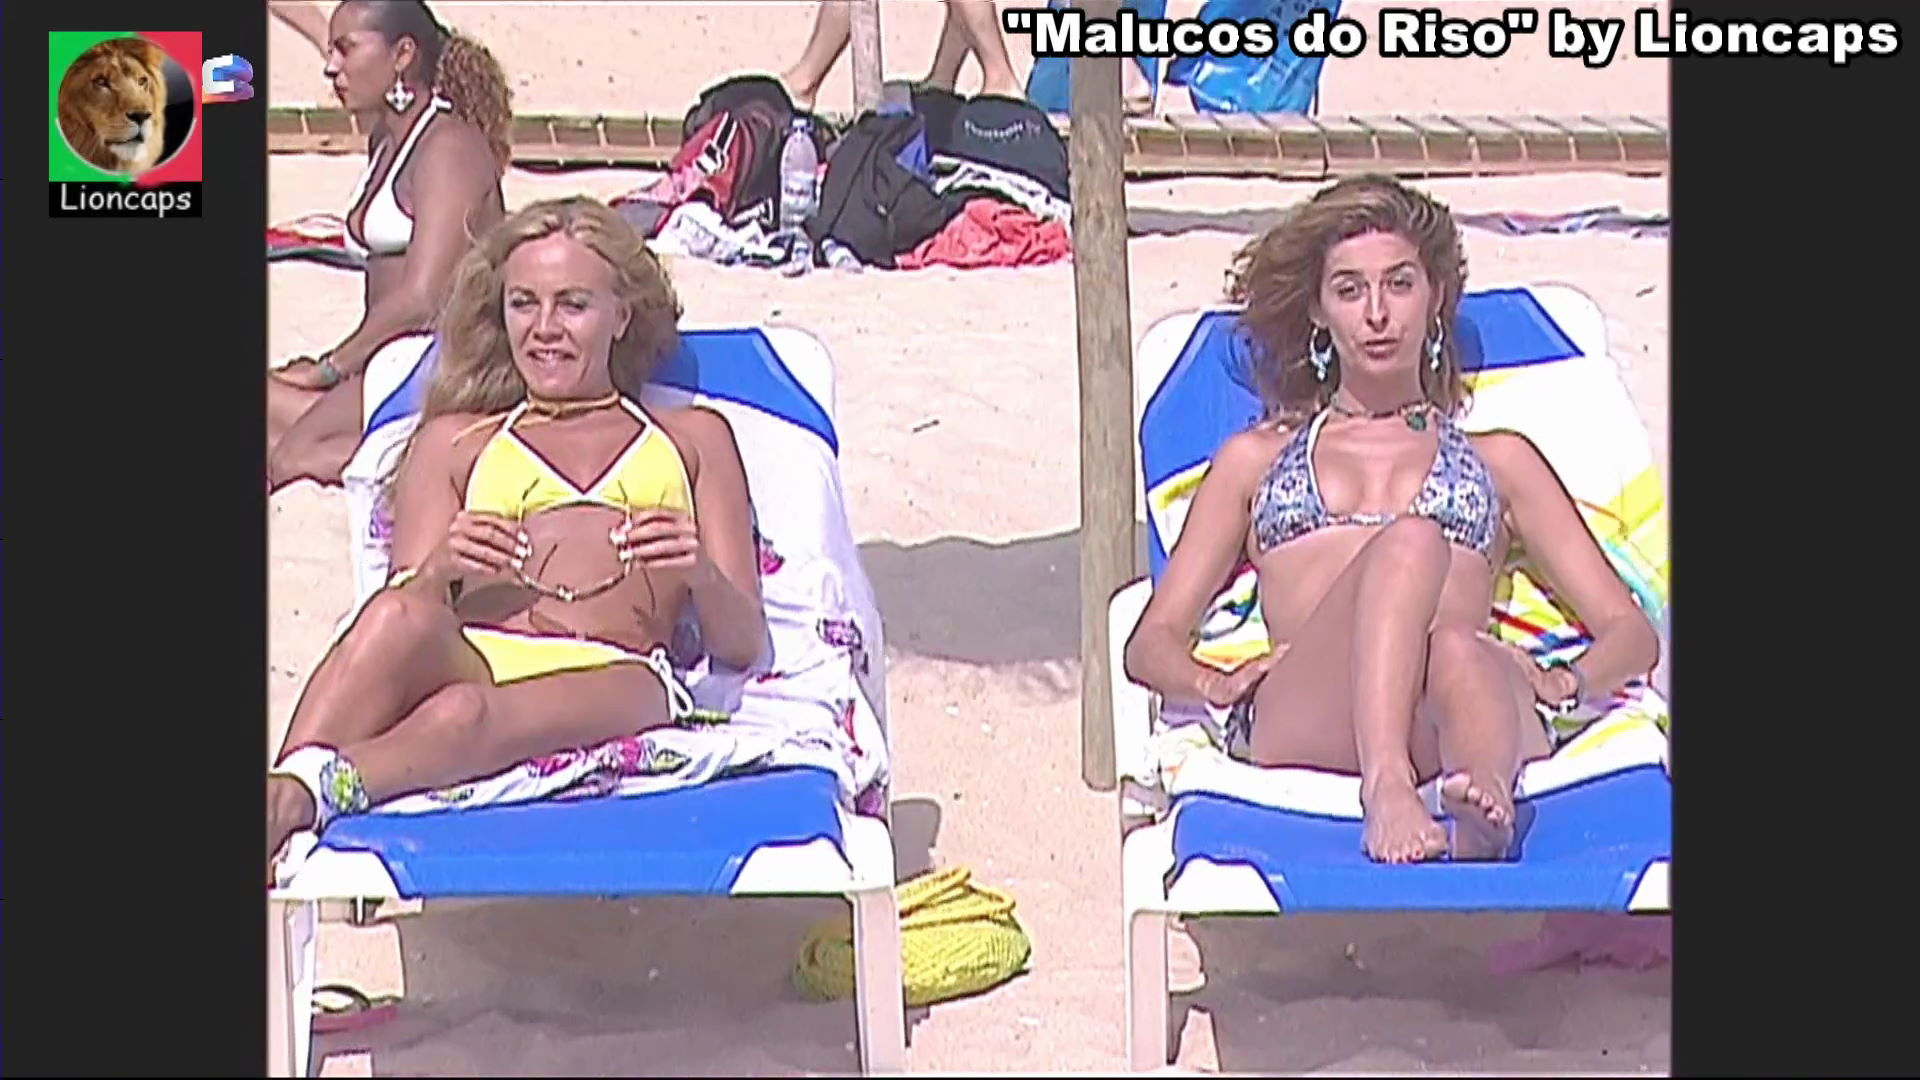 947519696_malucos_riso_alda_gomes_vs190malucos_riso_602_15093_122_353lo.JPG